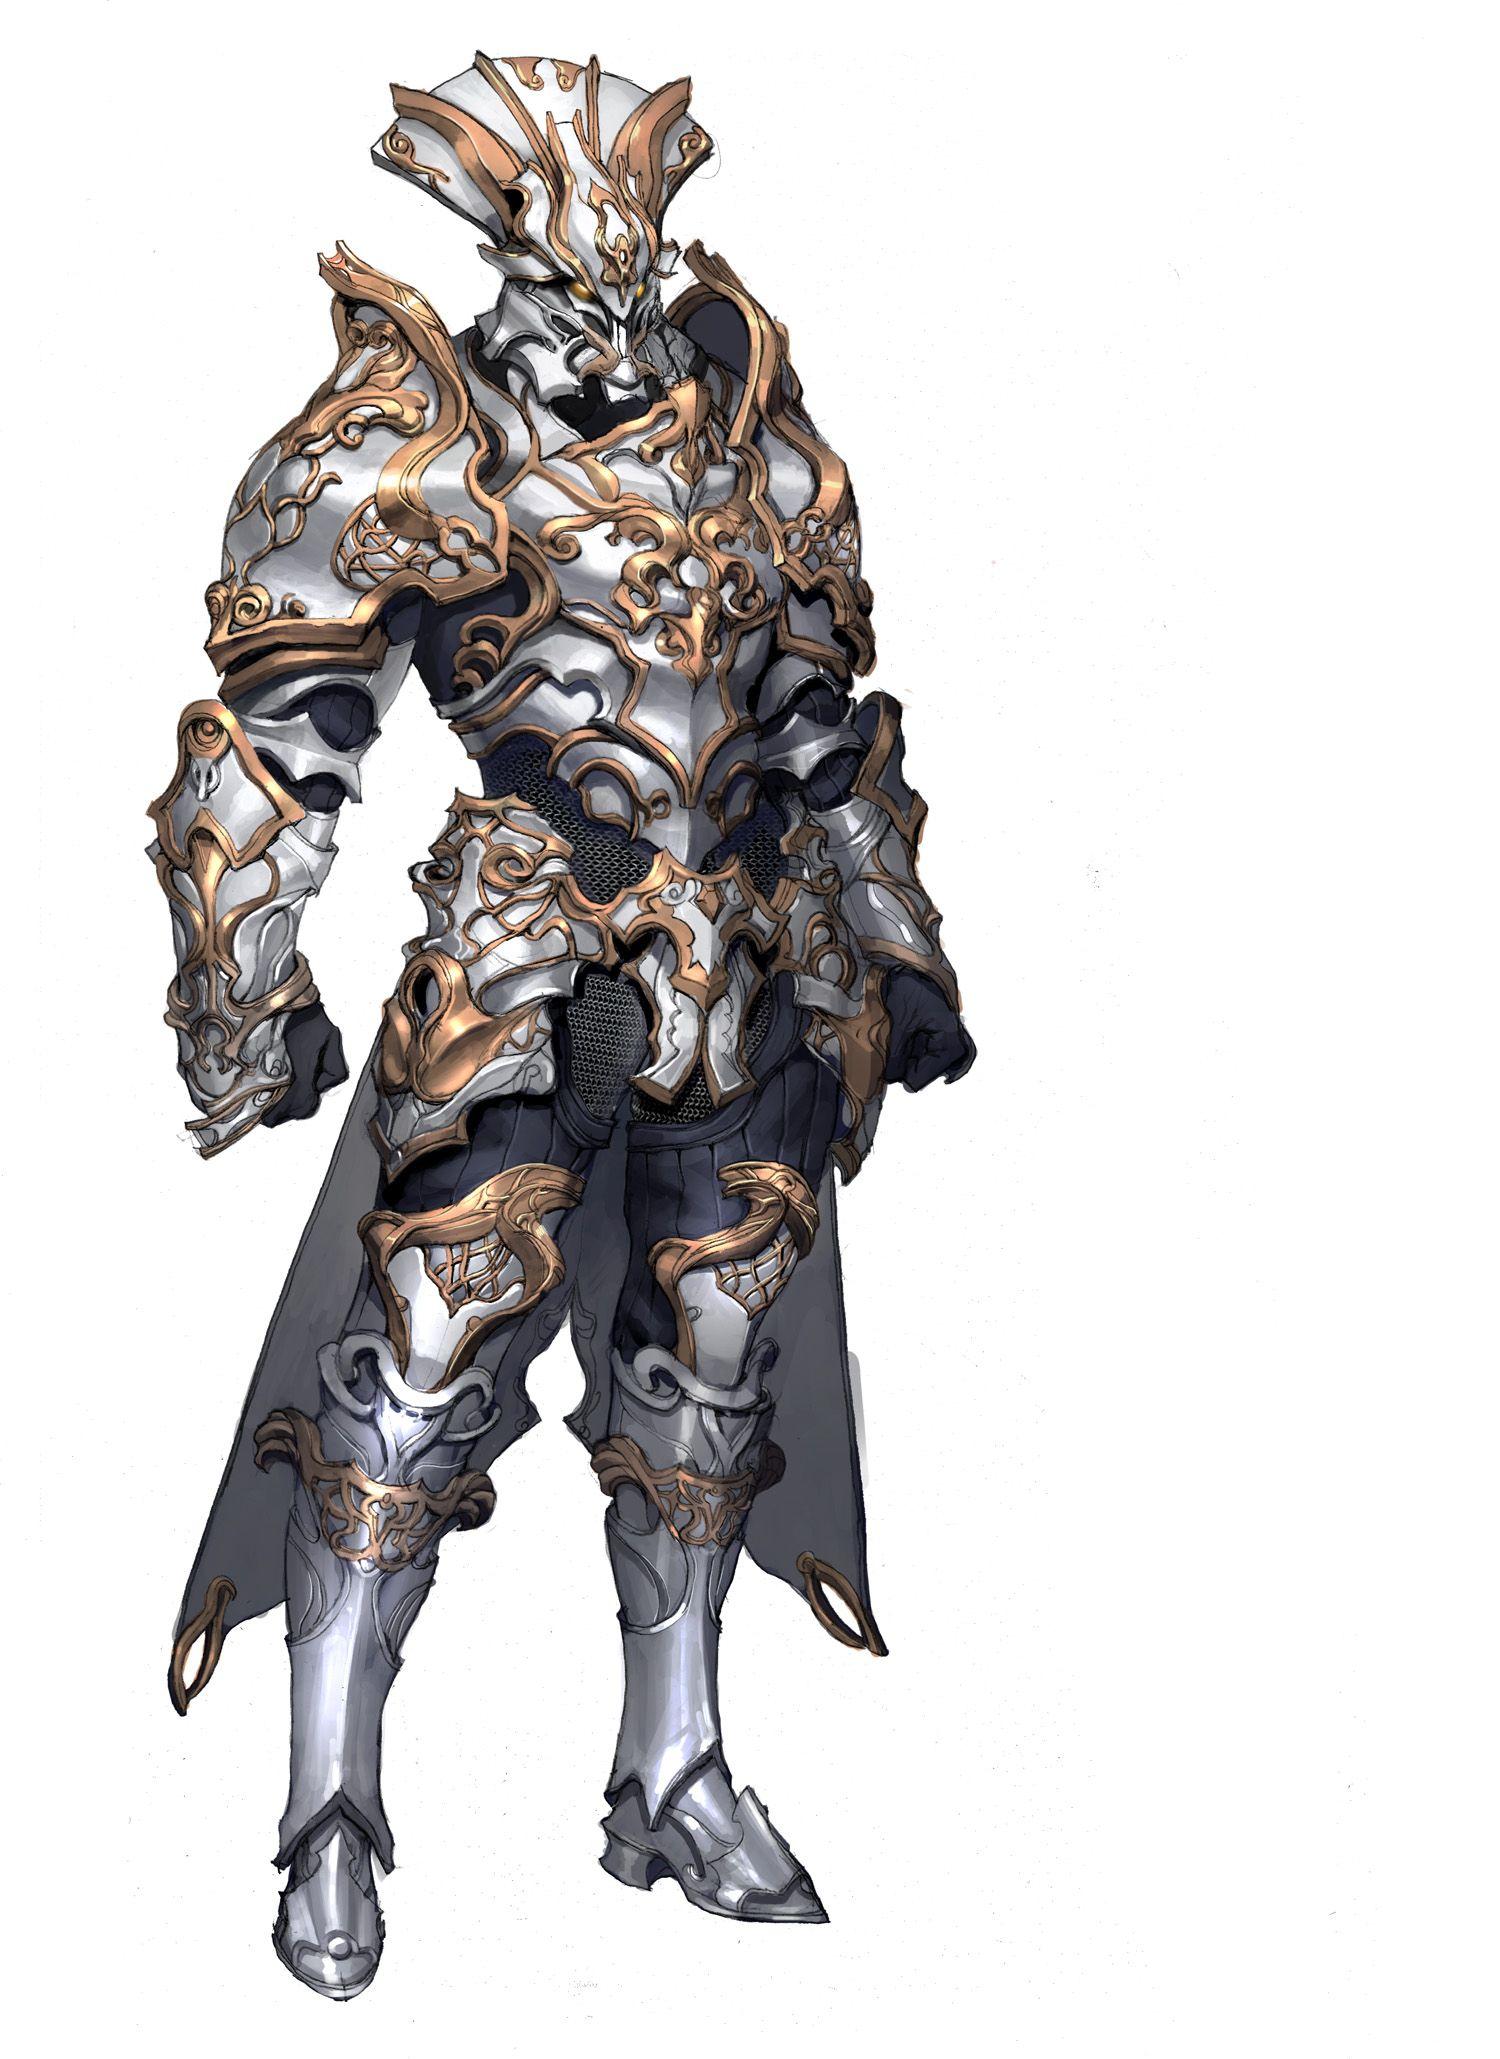 porcelain armor | Fantacy style | Pinterest